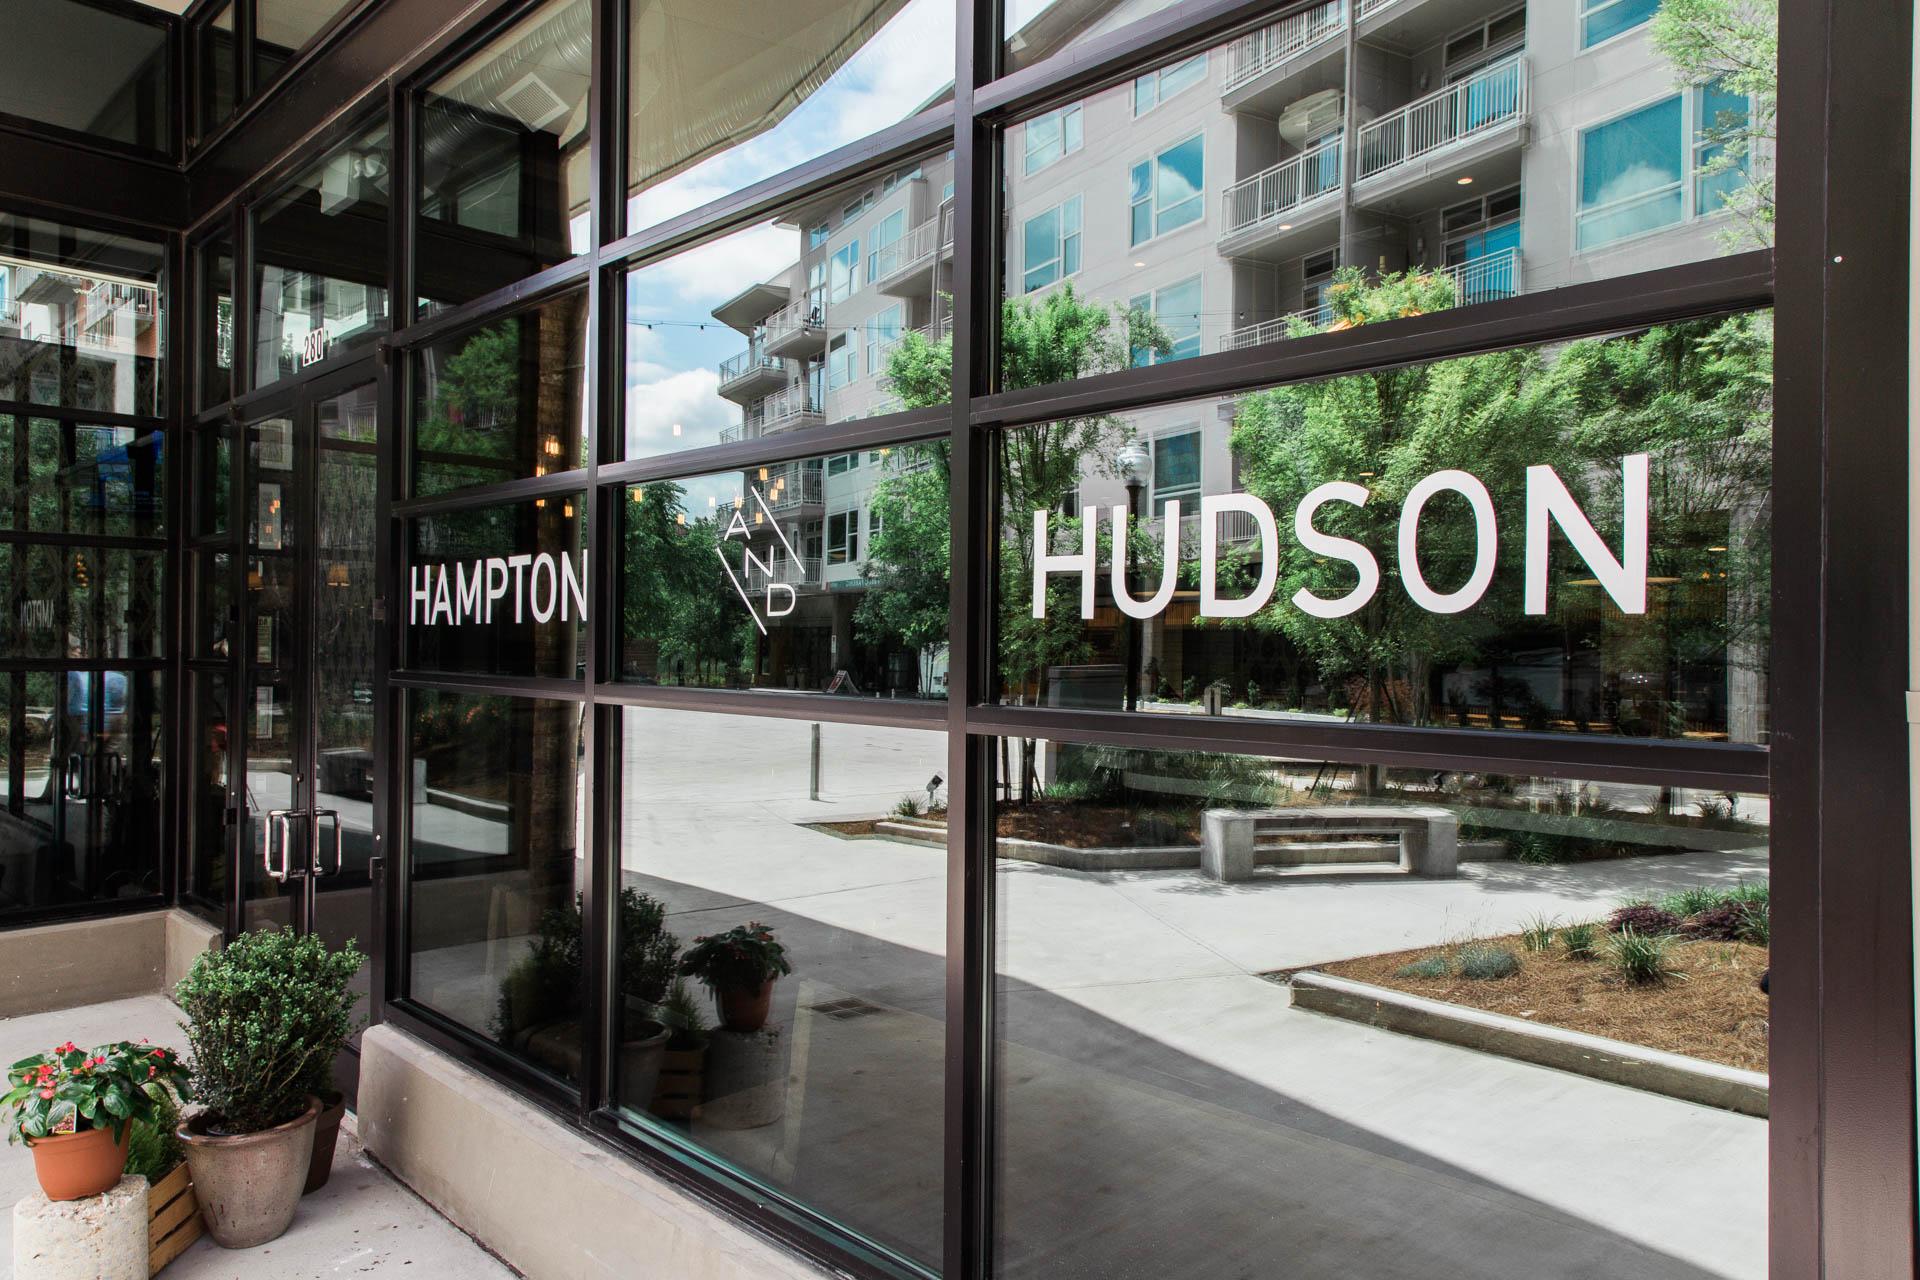 Hampton & Hudson